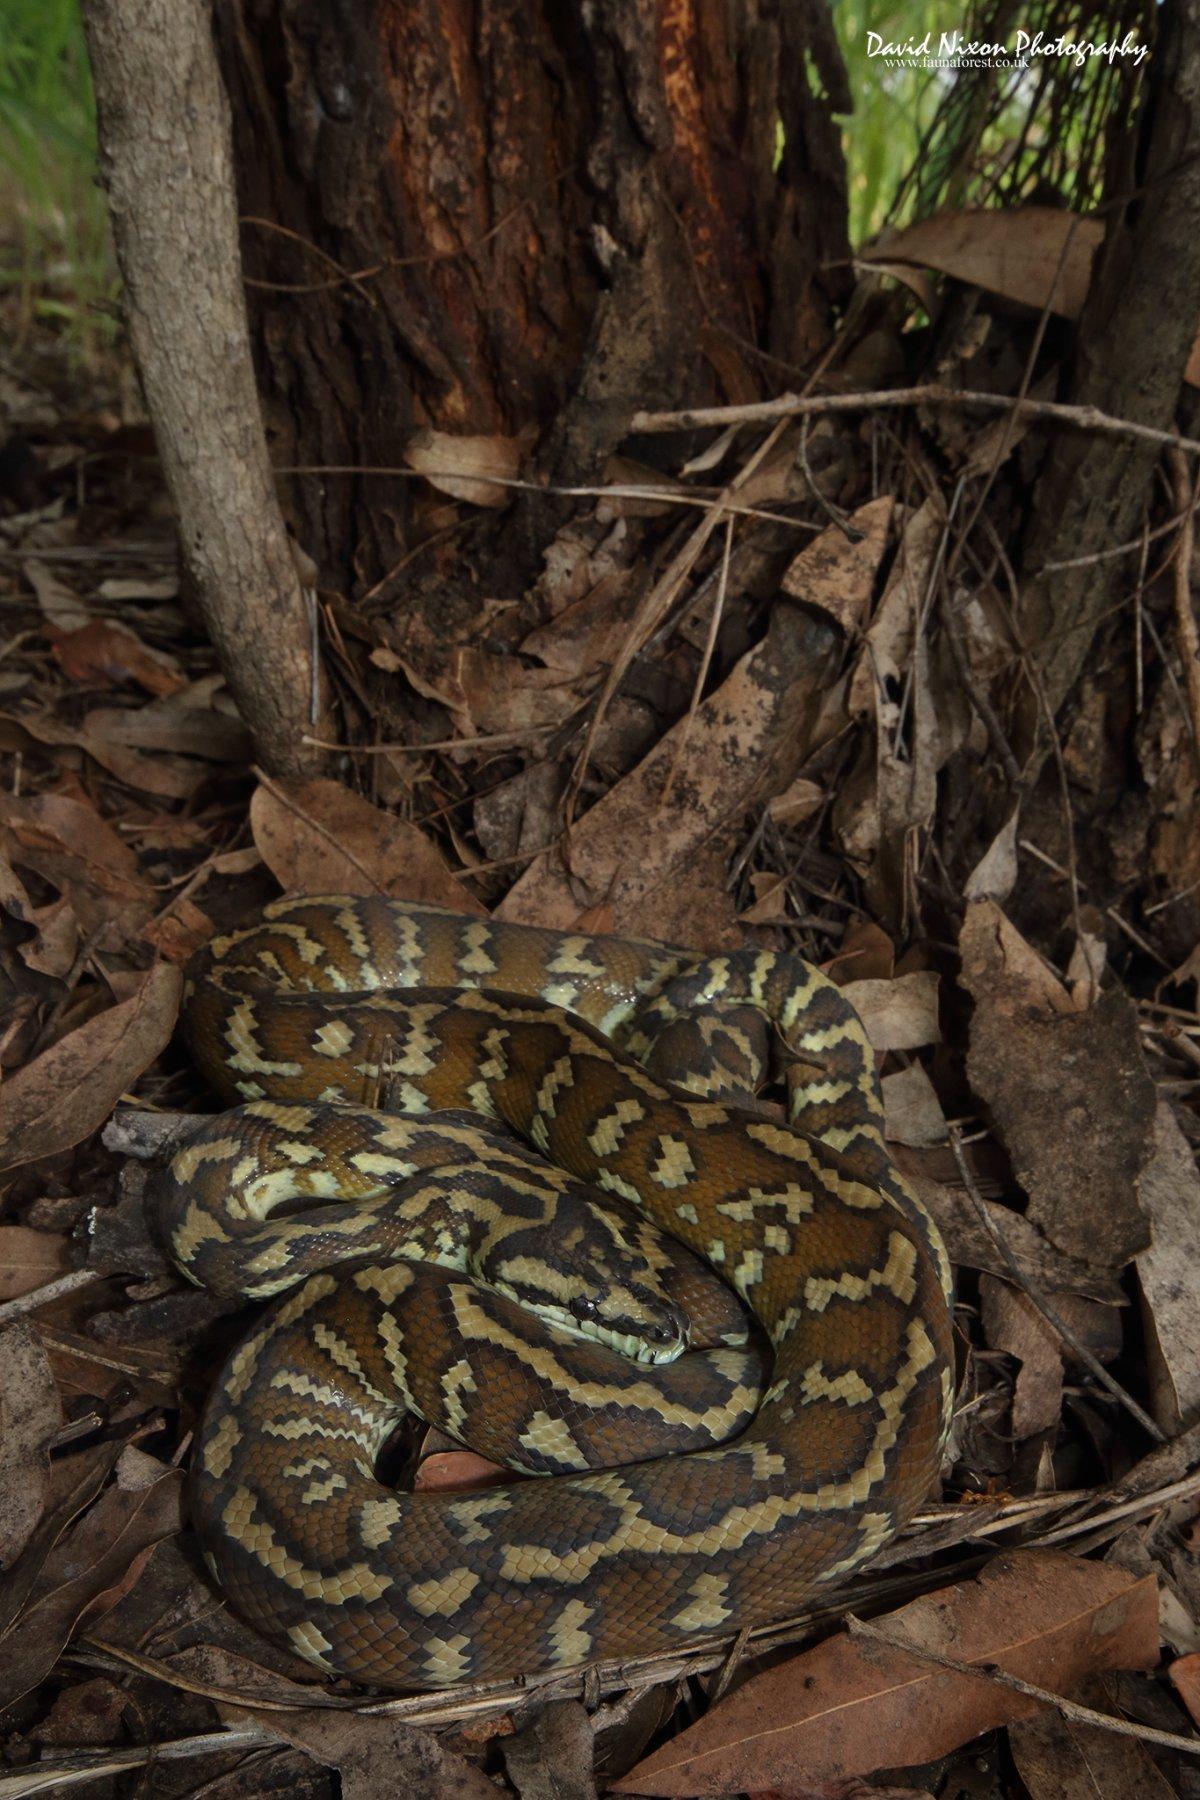 Papuan Carpet Python, Morelia spilota